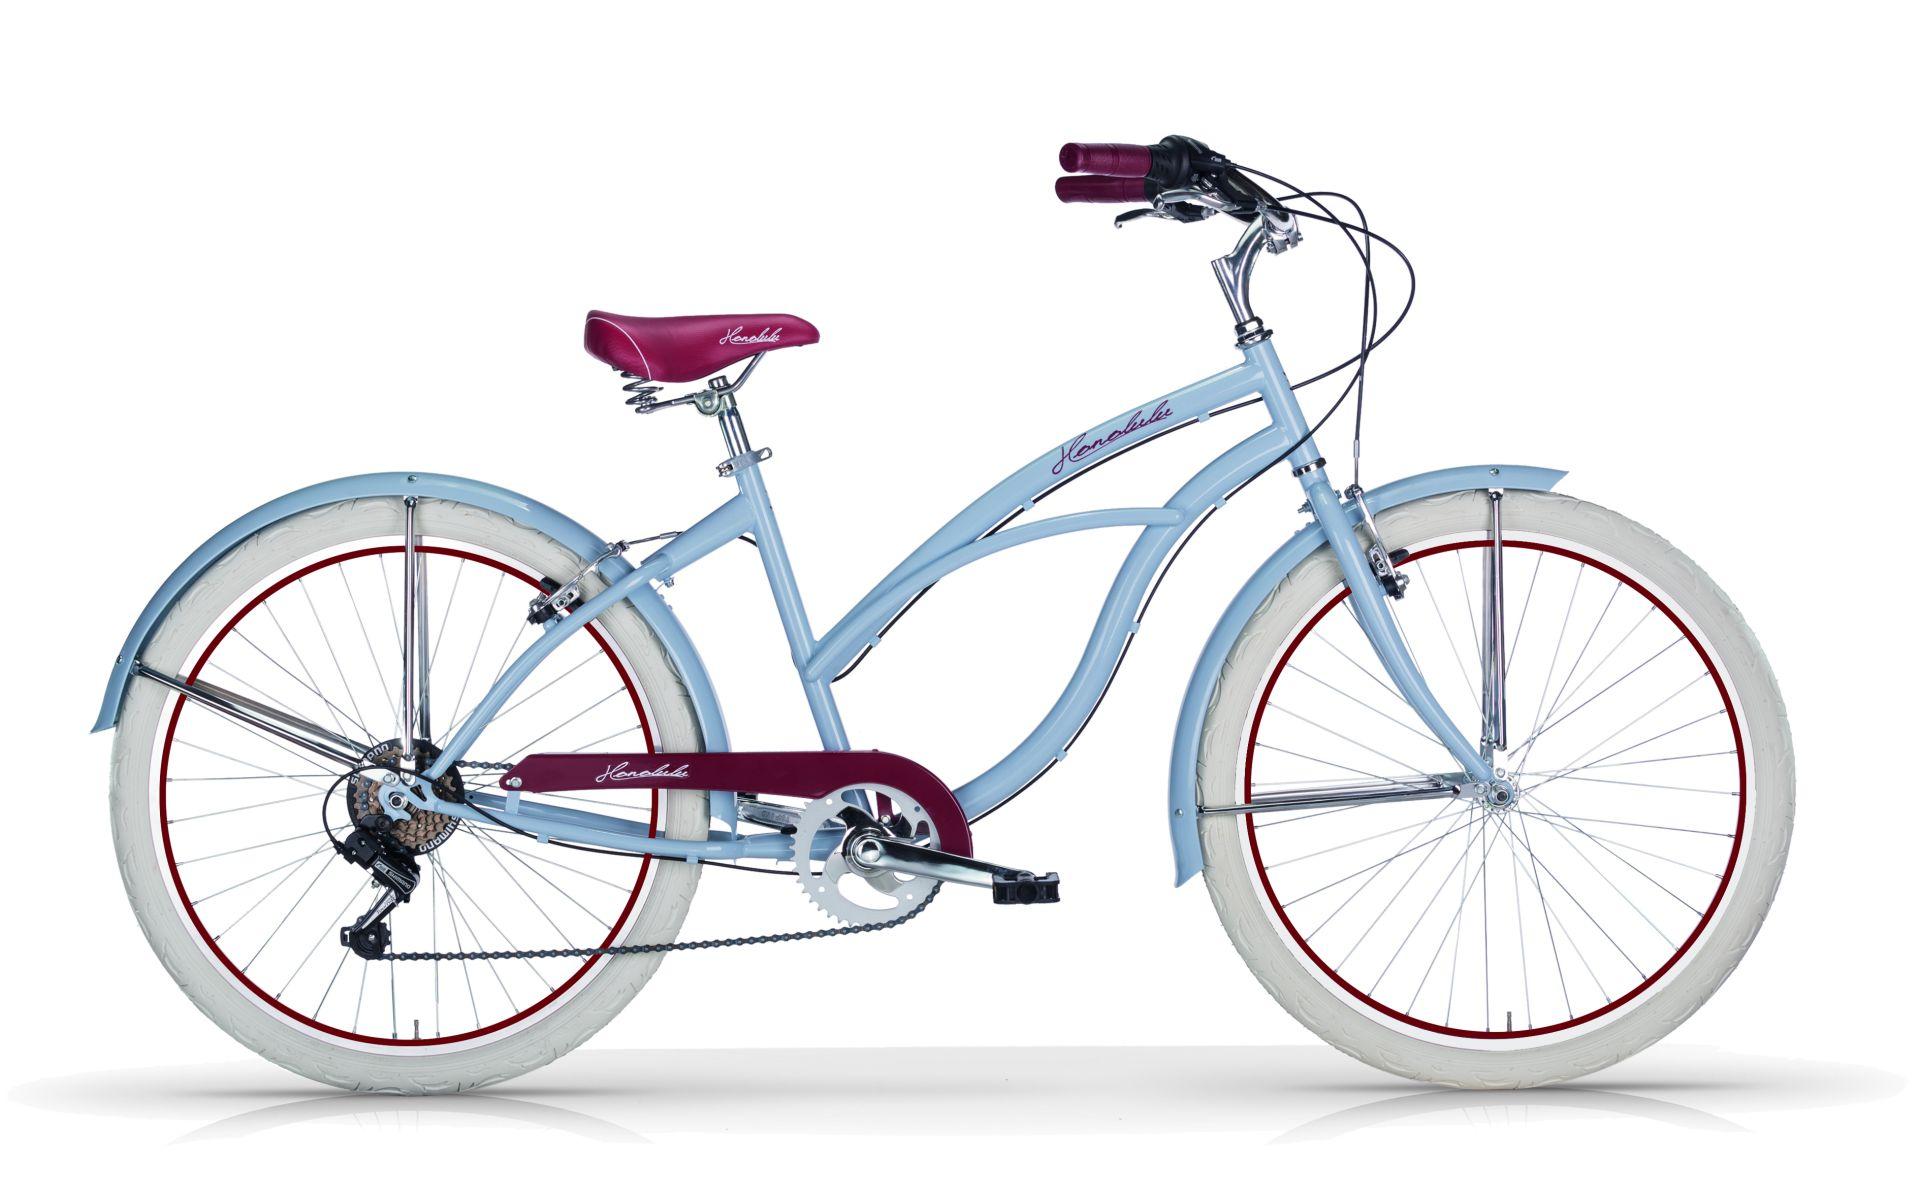 Bici Cruiser Donna Mbm Honolulu 26 6v Le Due Ruote